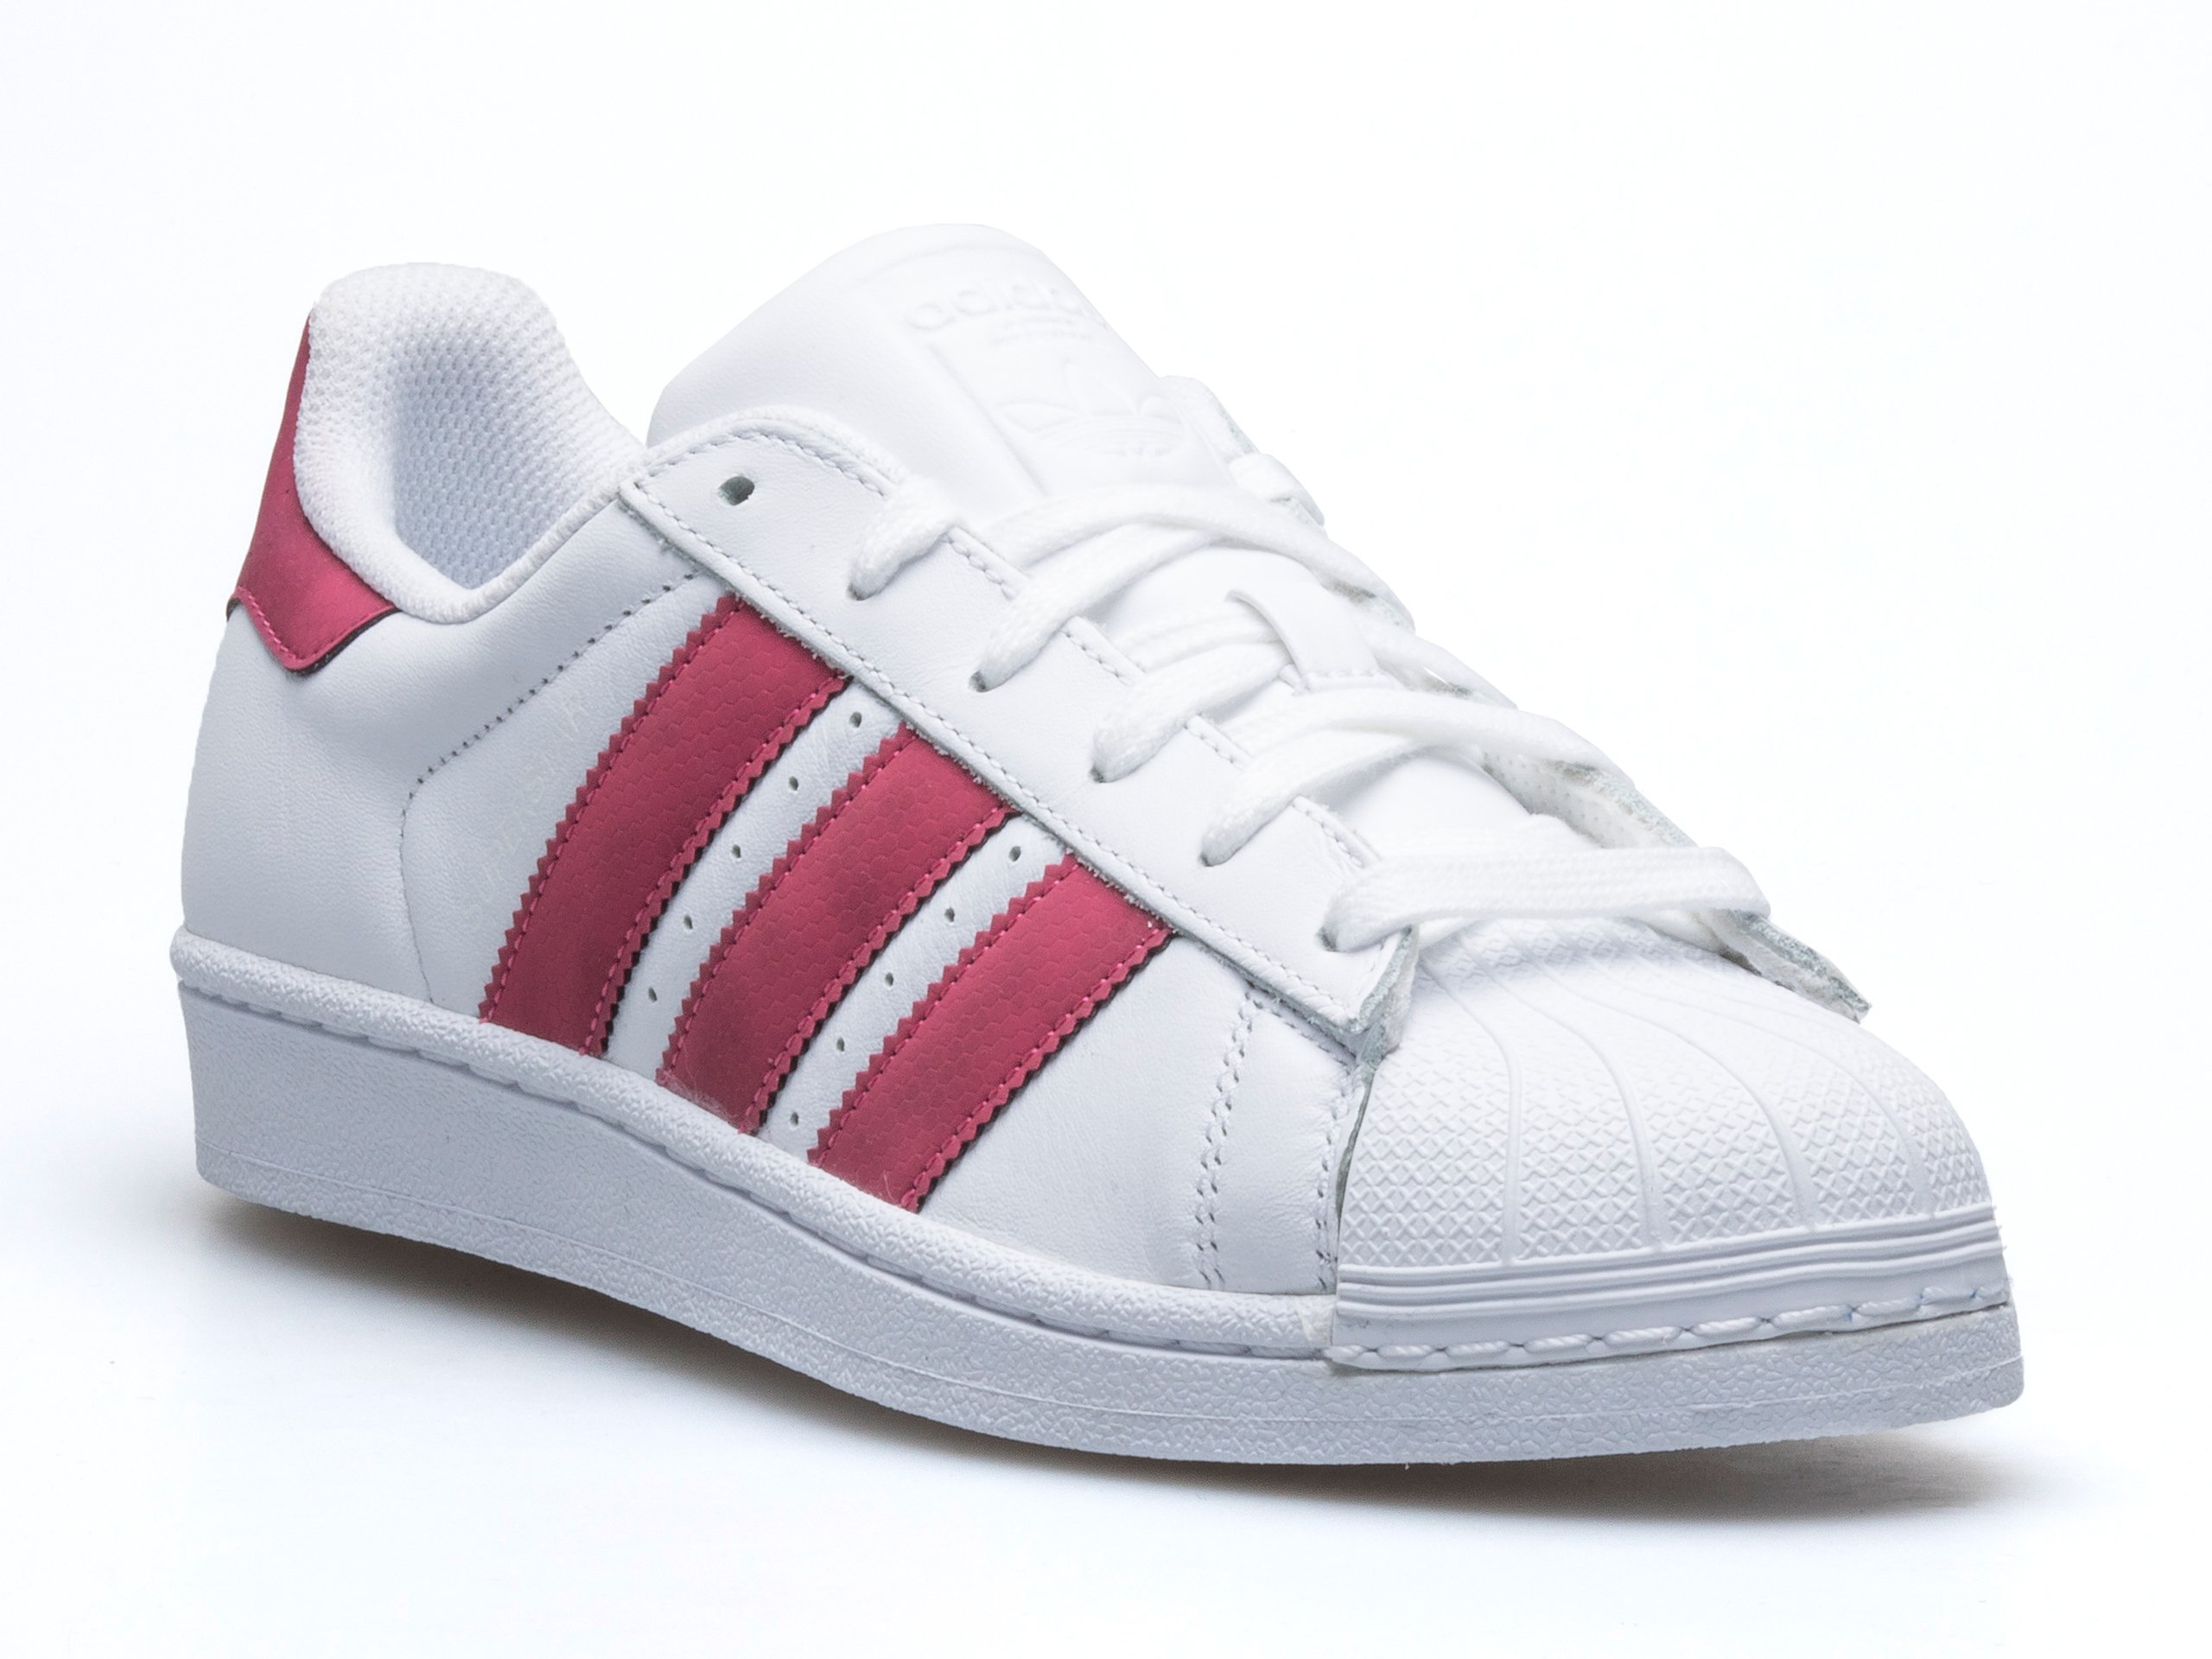 3c0e52d841 Obuv Adidas Superstar J - CQ2690